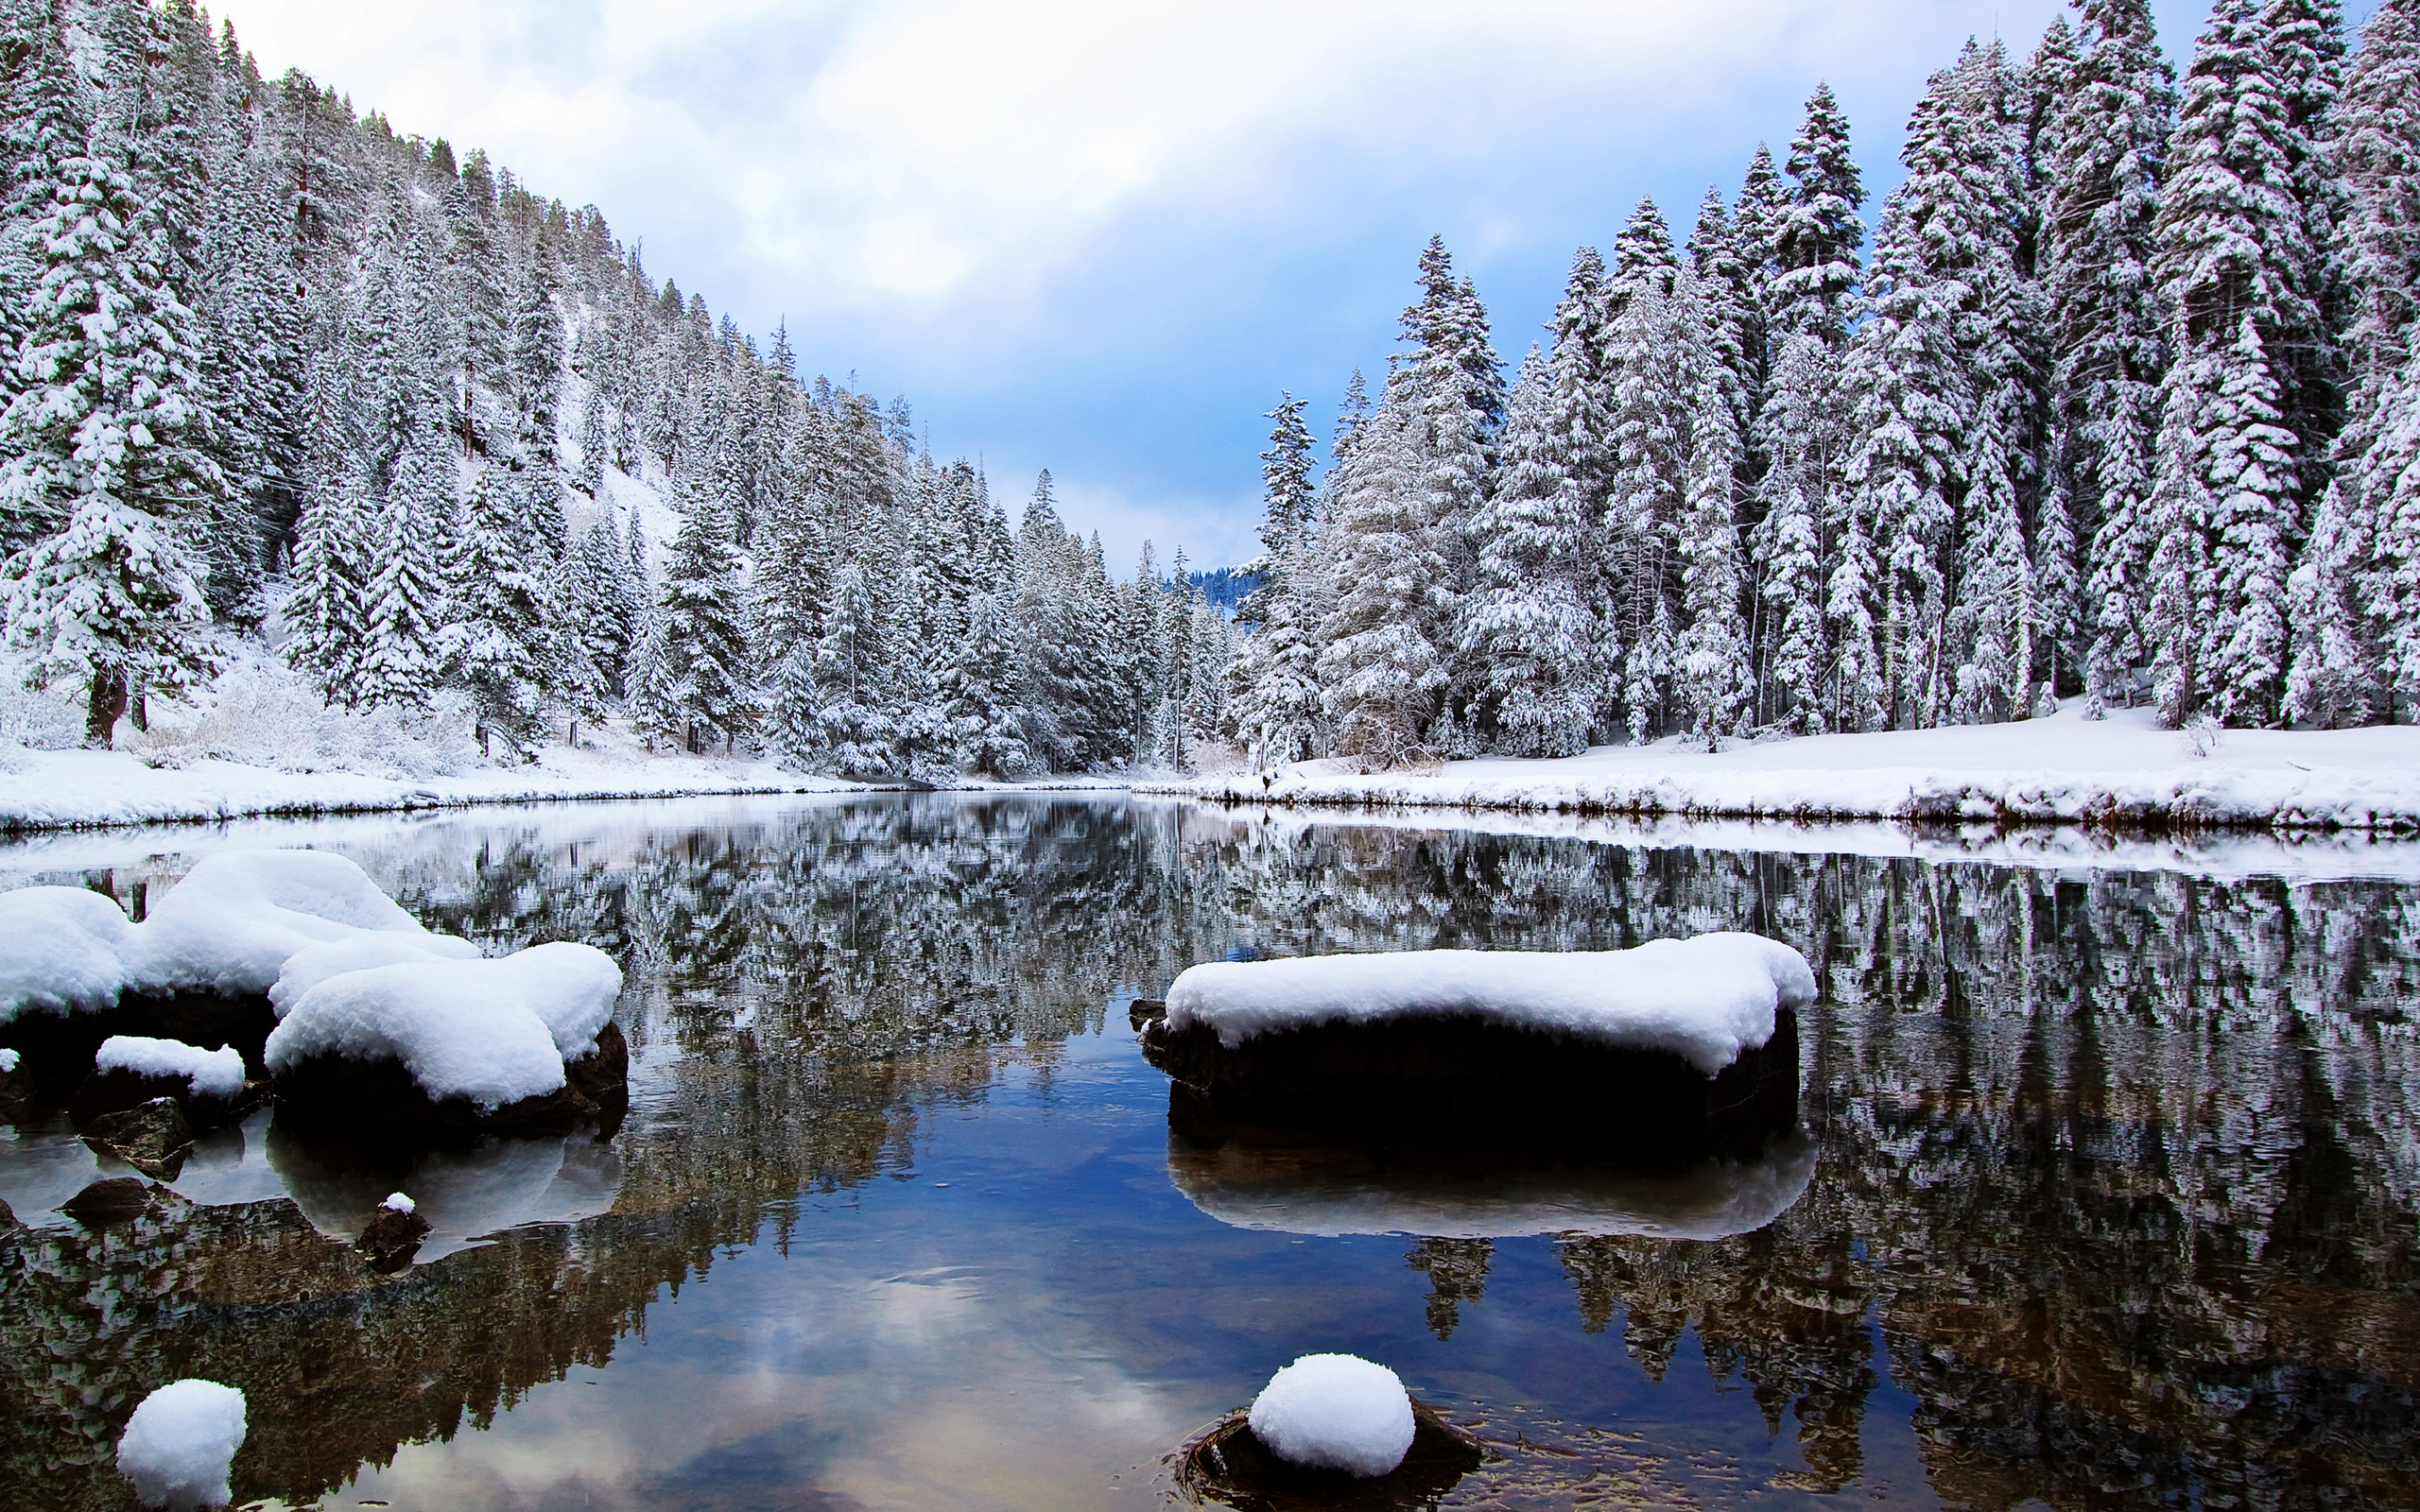 Winter Desktop Wallpapers FREE on Latorocom 2560x1600